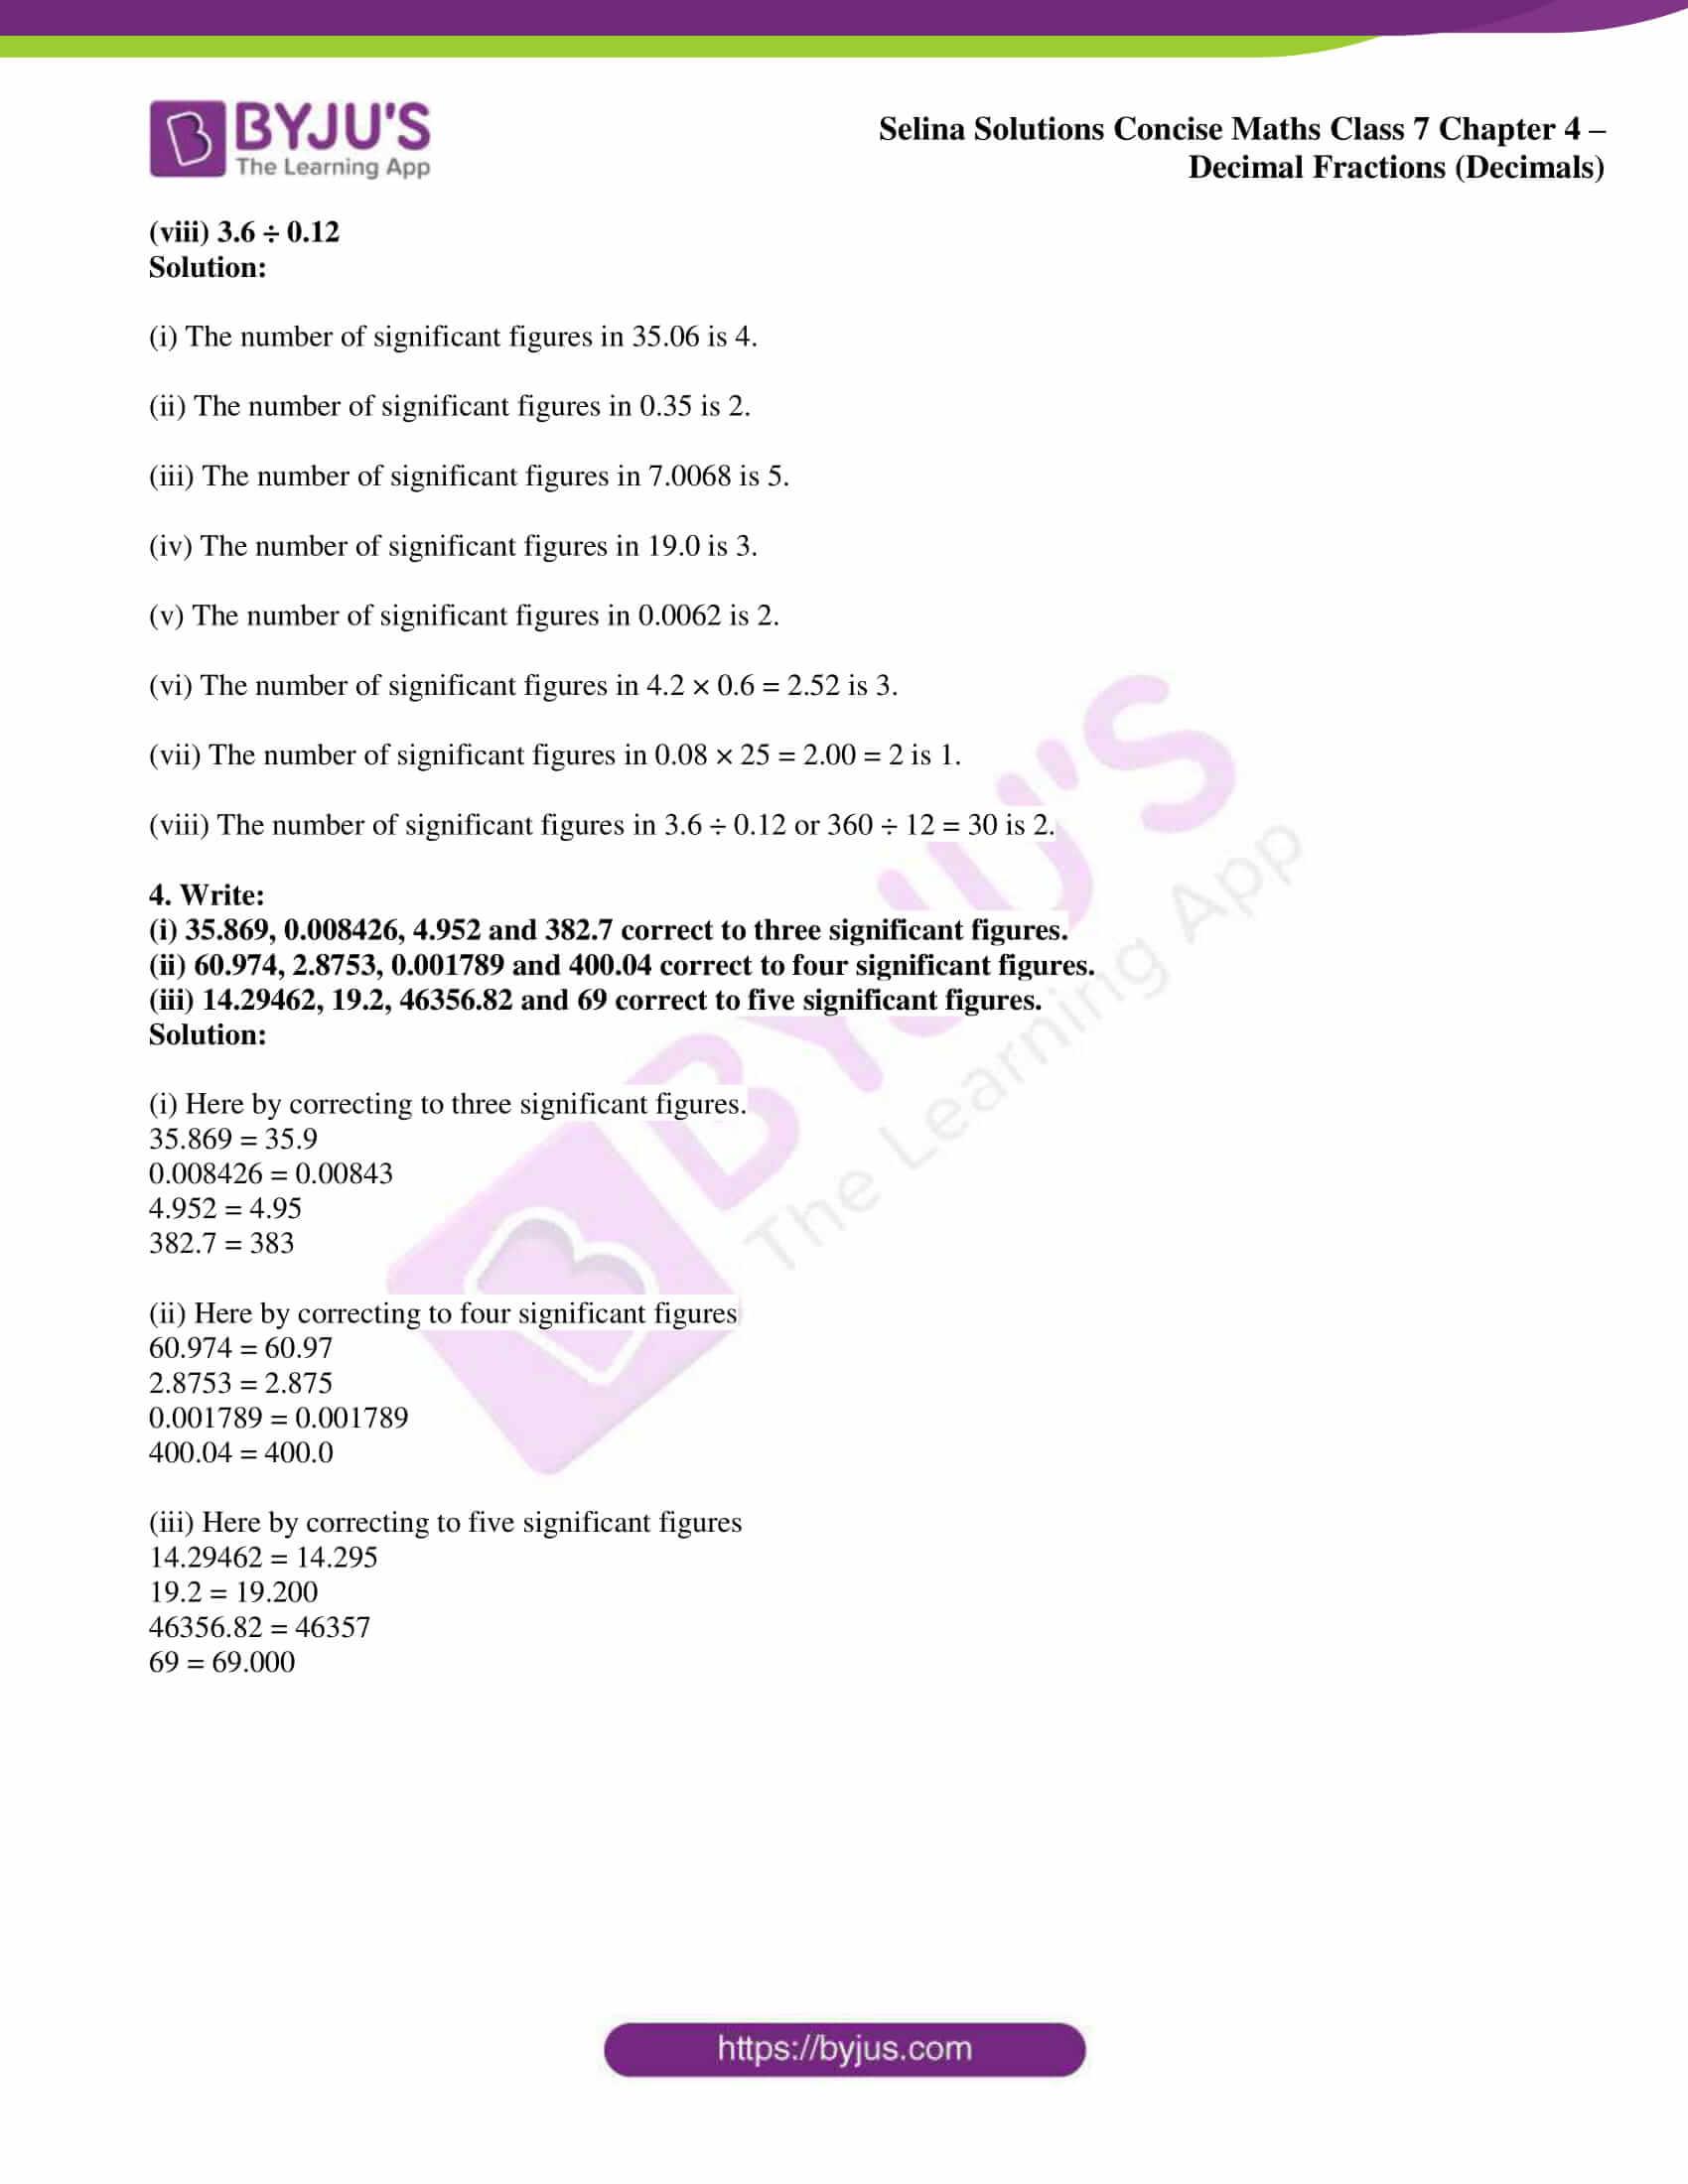 selina sol concise maths class 7 ch4 ex 4e 2